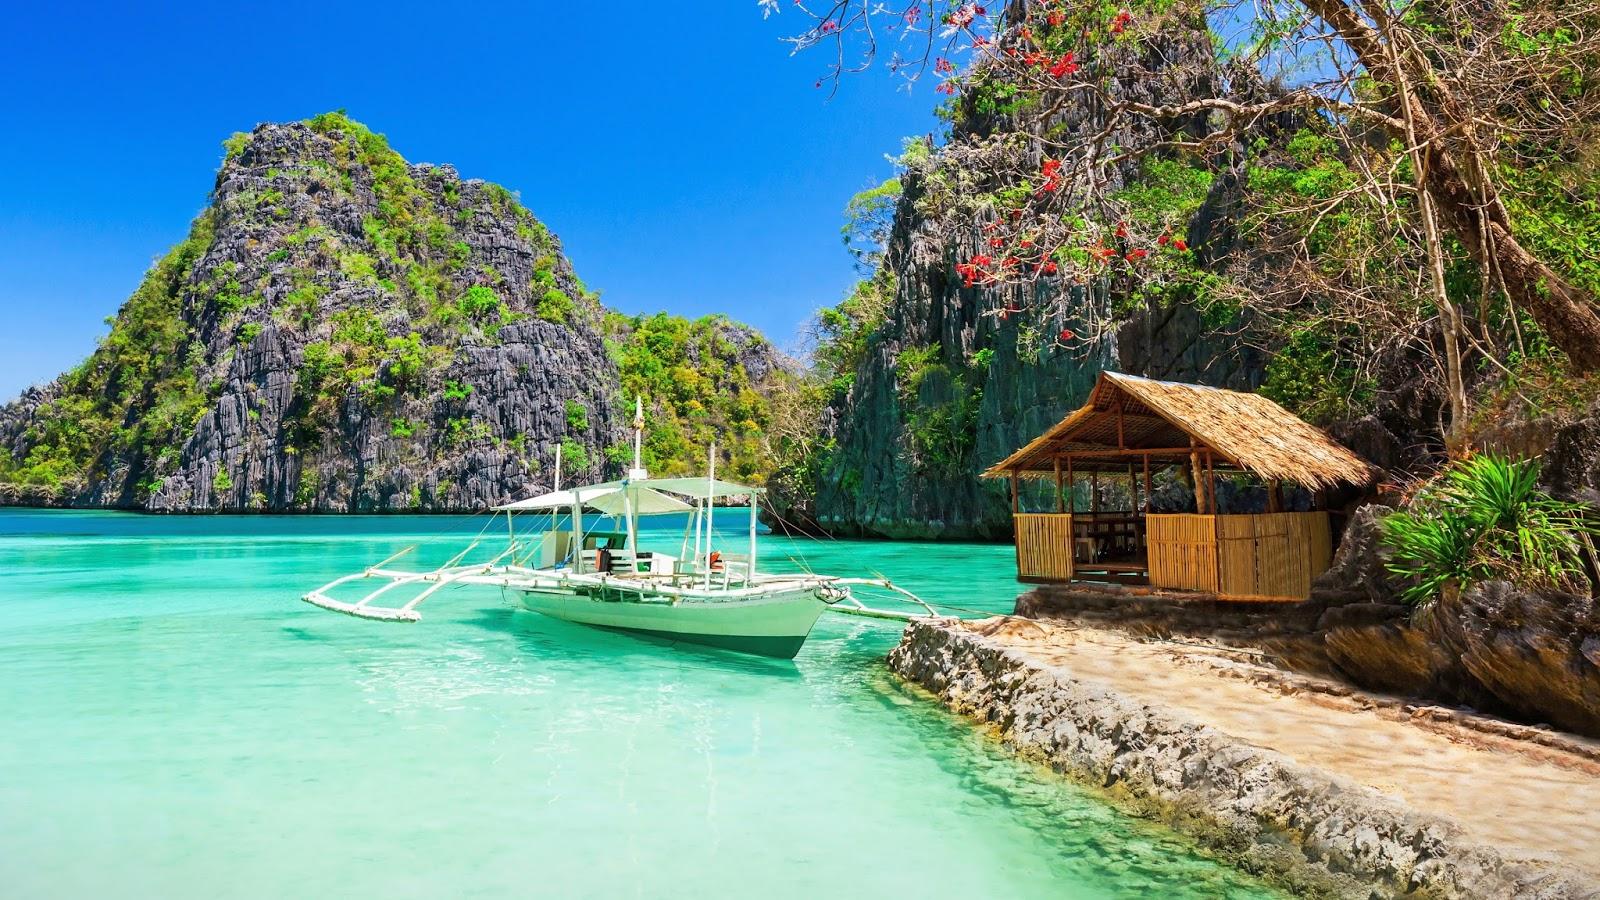 Morning Beach Resort Boracay Philippines